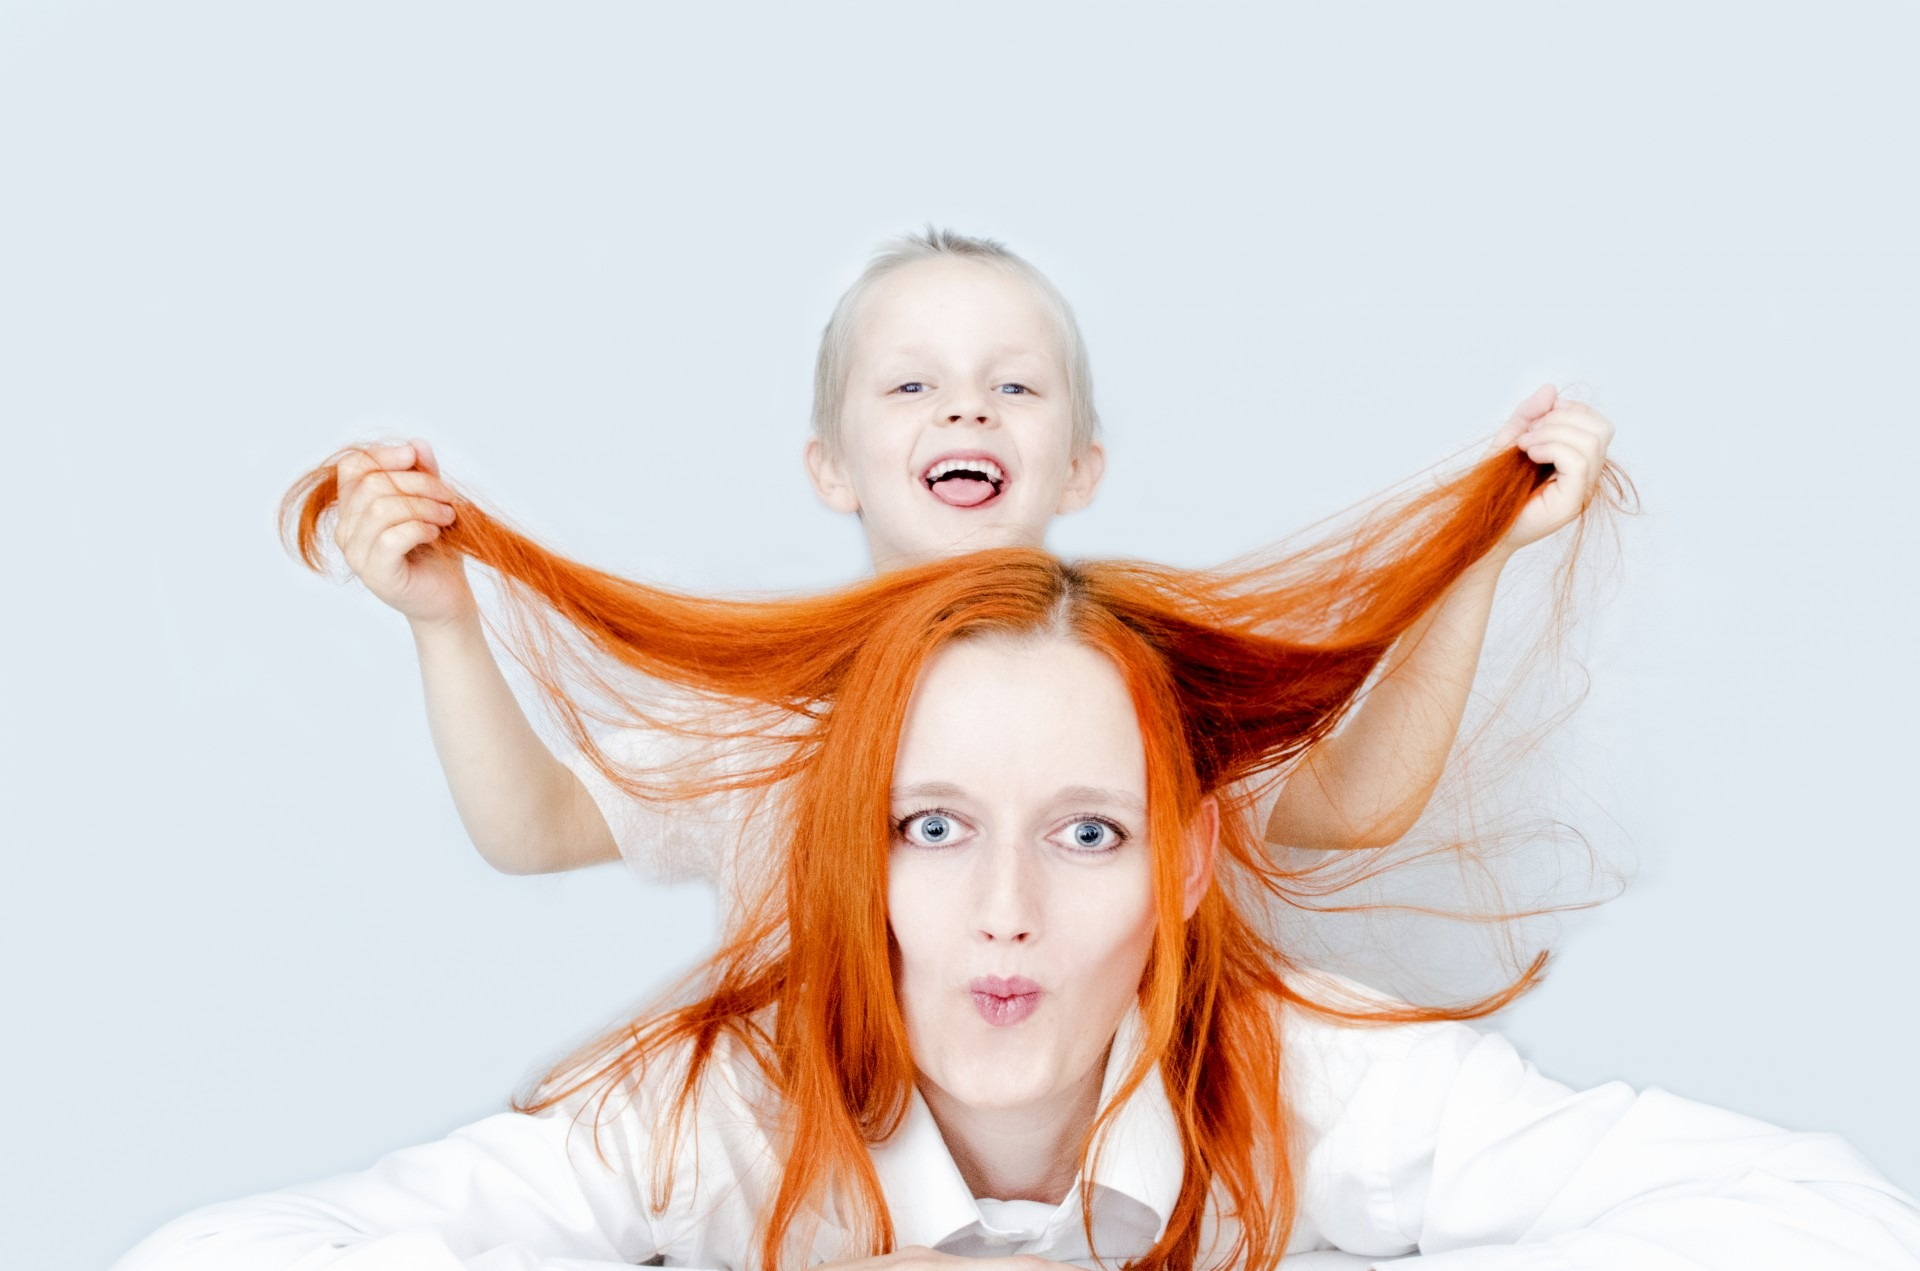 copii obraznici - sfatulparintilor.ro - pixabay_com